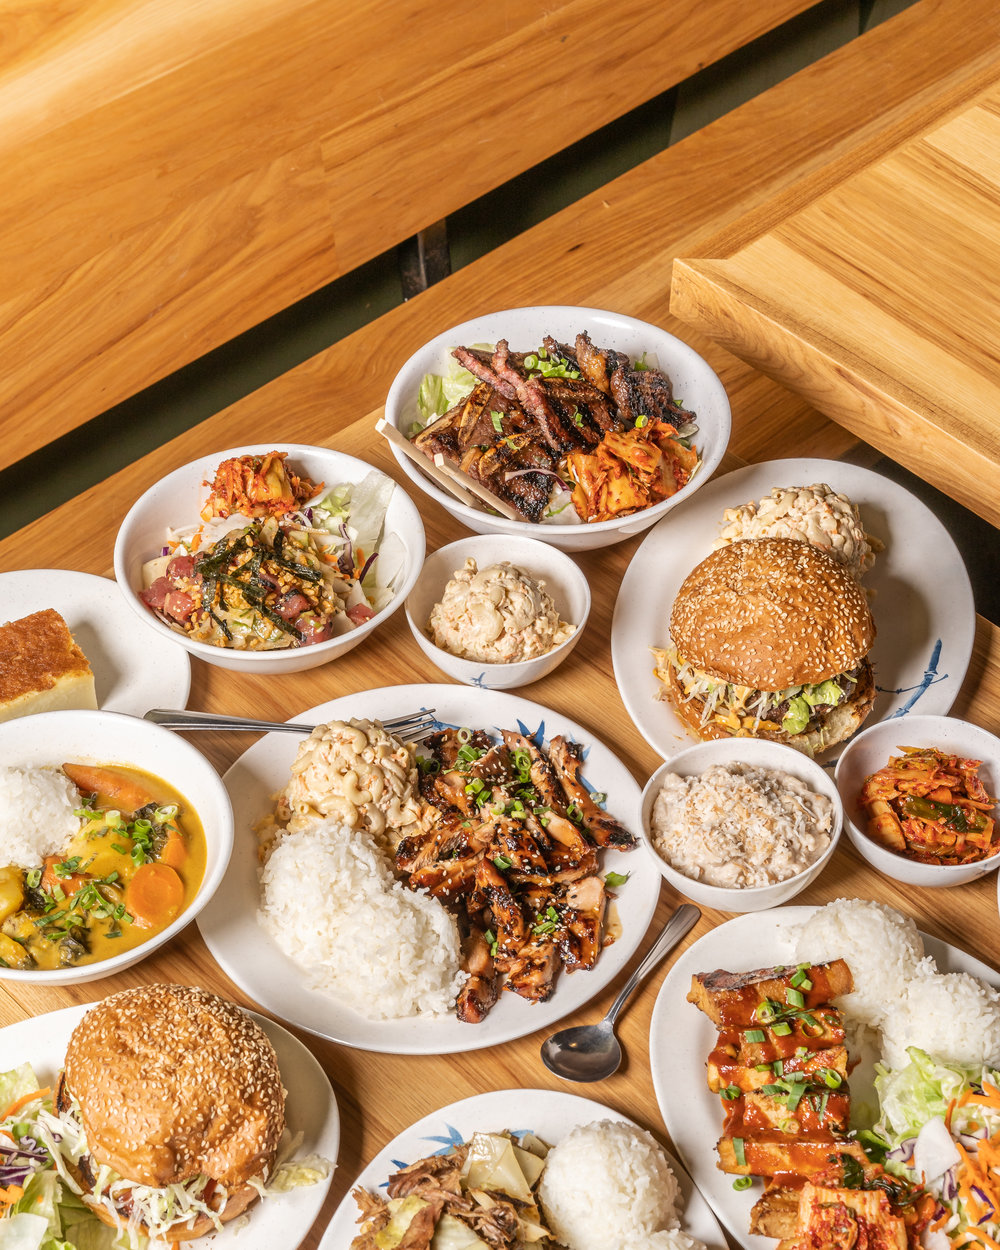 jeremy pawlowski portland oregon food photographer for hire photography canyon creative Hawaiian food